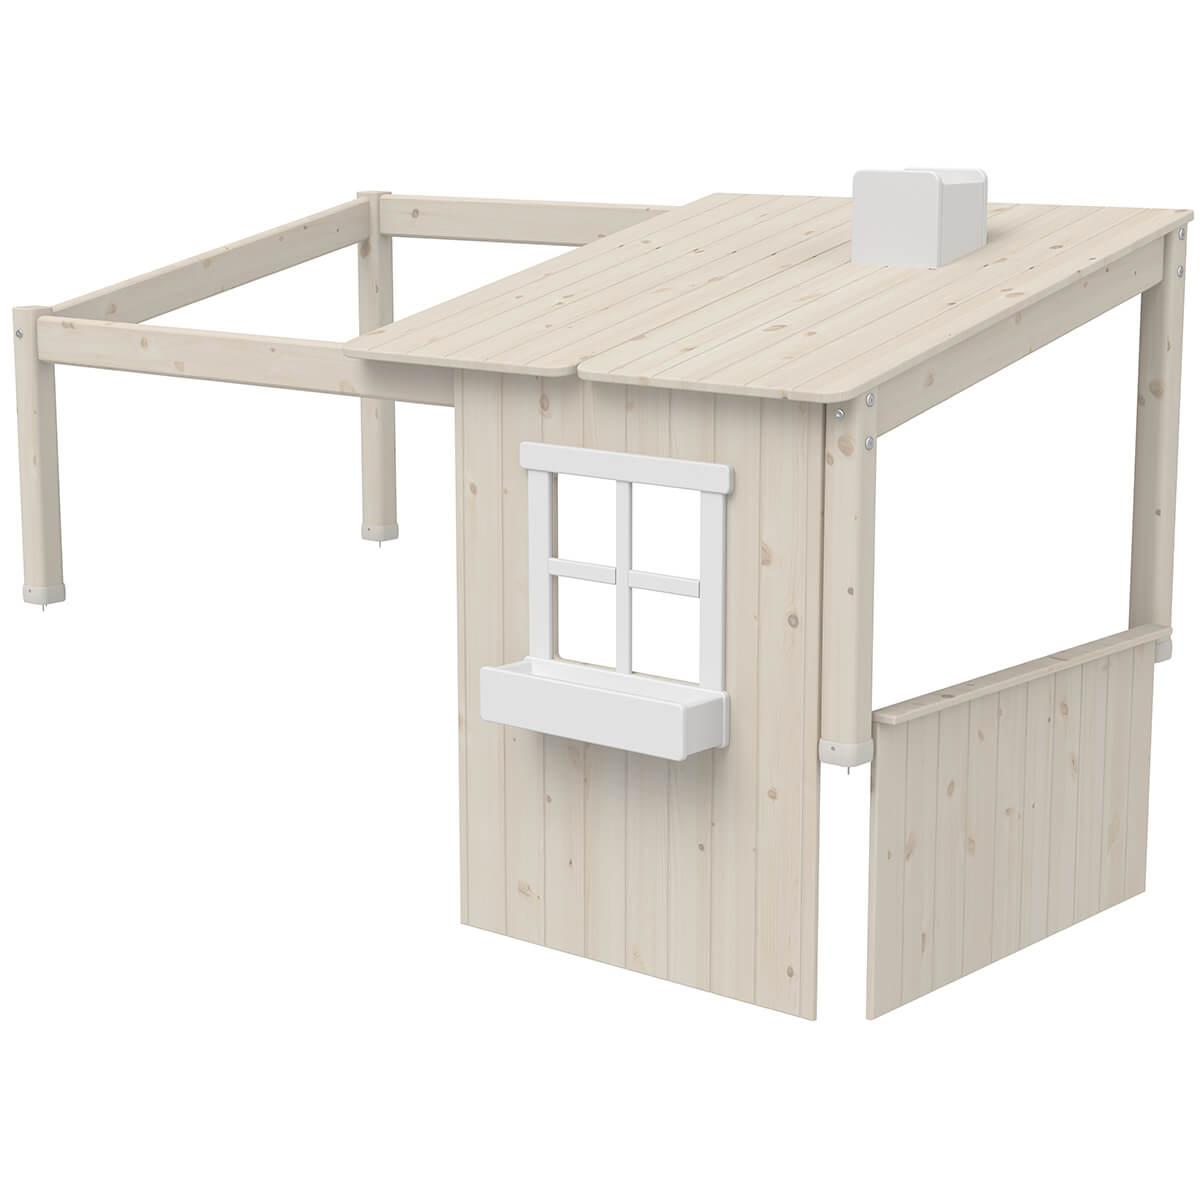 Structure toit lit cabane 190cm 1/2 PLAY HOUSE CLASSIC Flexa blanchi-blanc